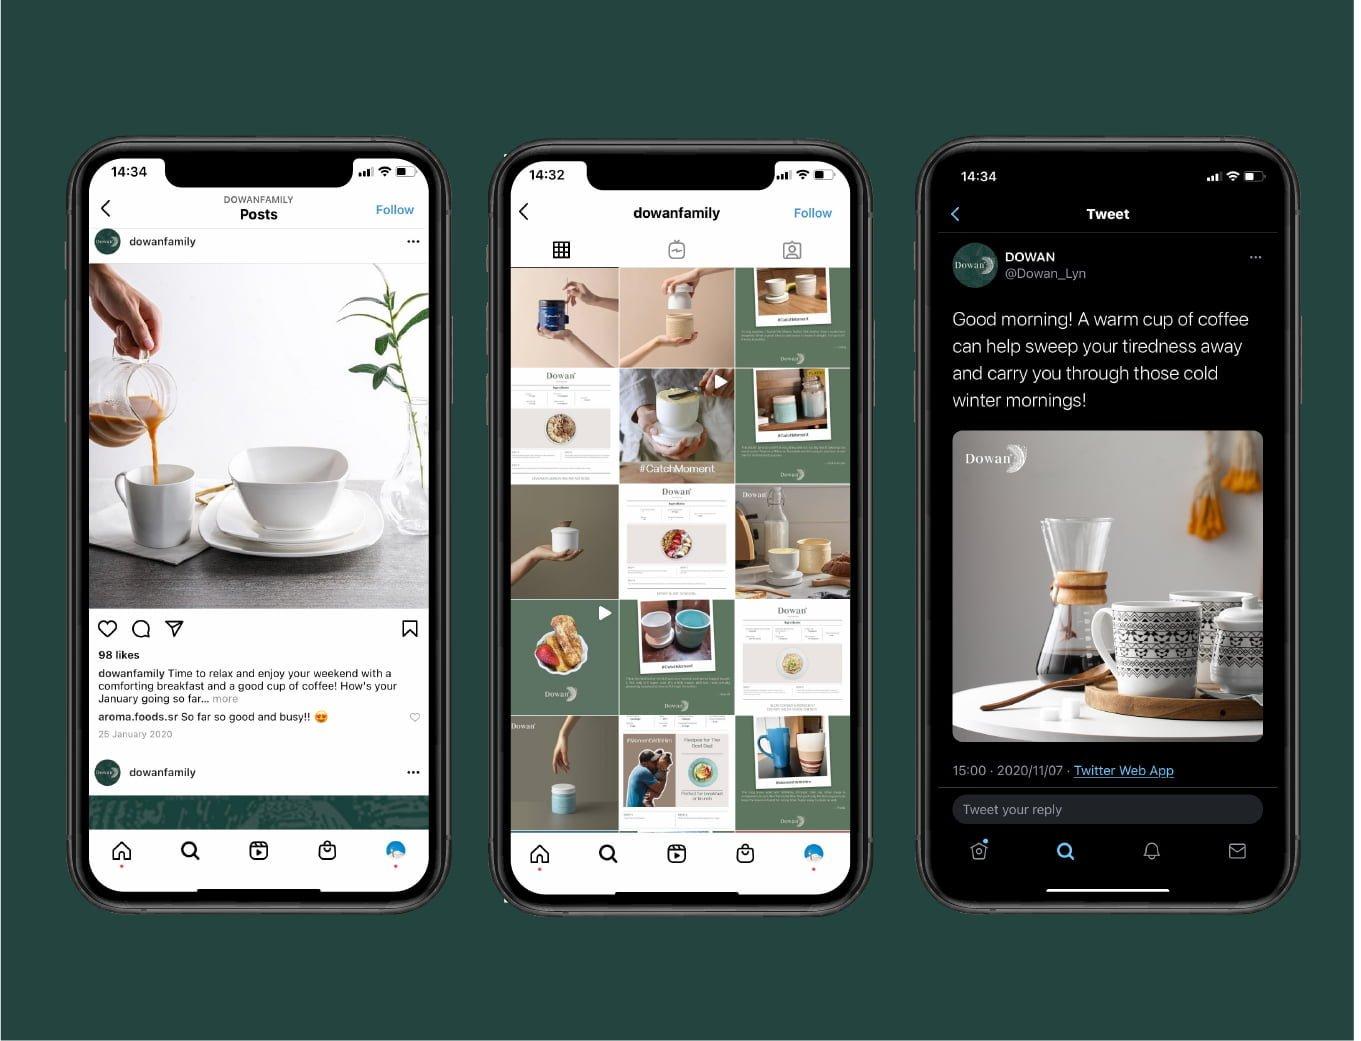 Dowan ecommerce retail digital marketing on Instagram and tweeter